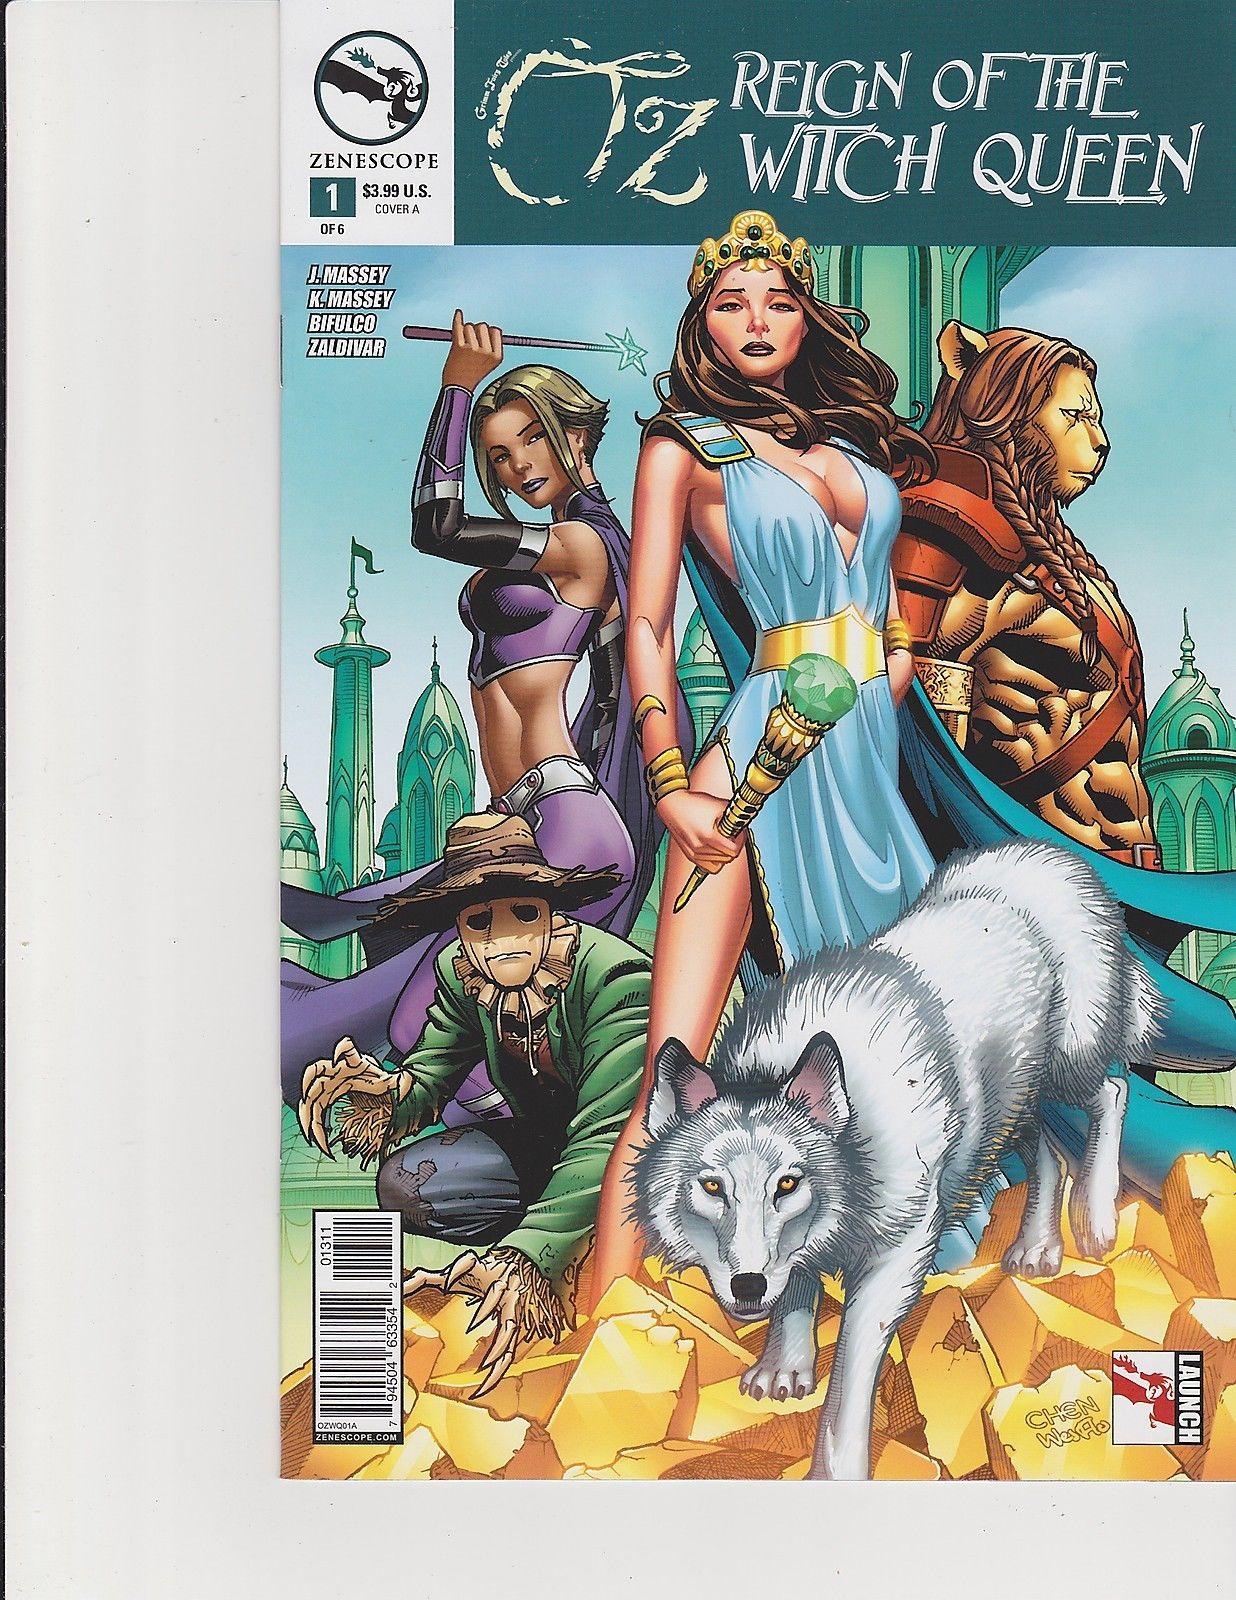 Wonderland #36 Cover C GFT Zenescope NM Qualano